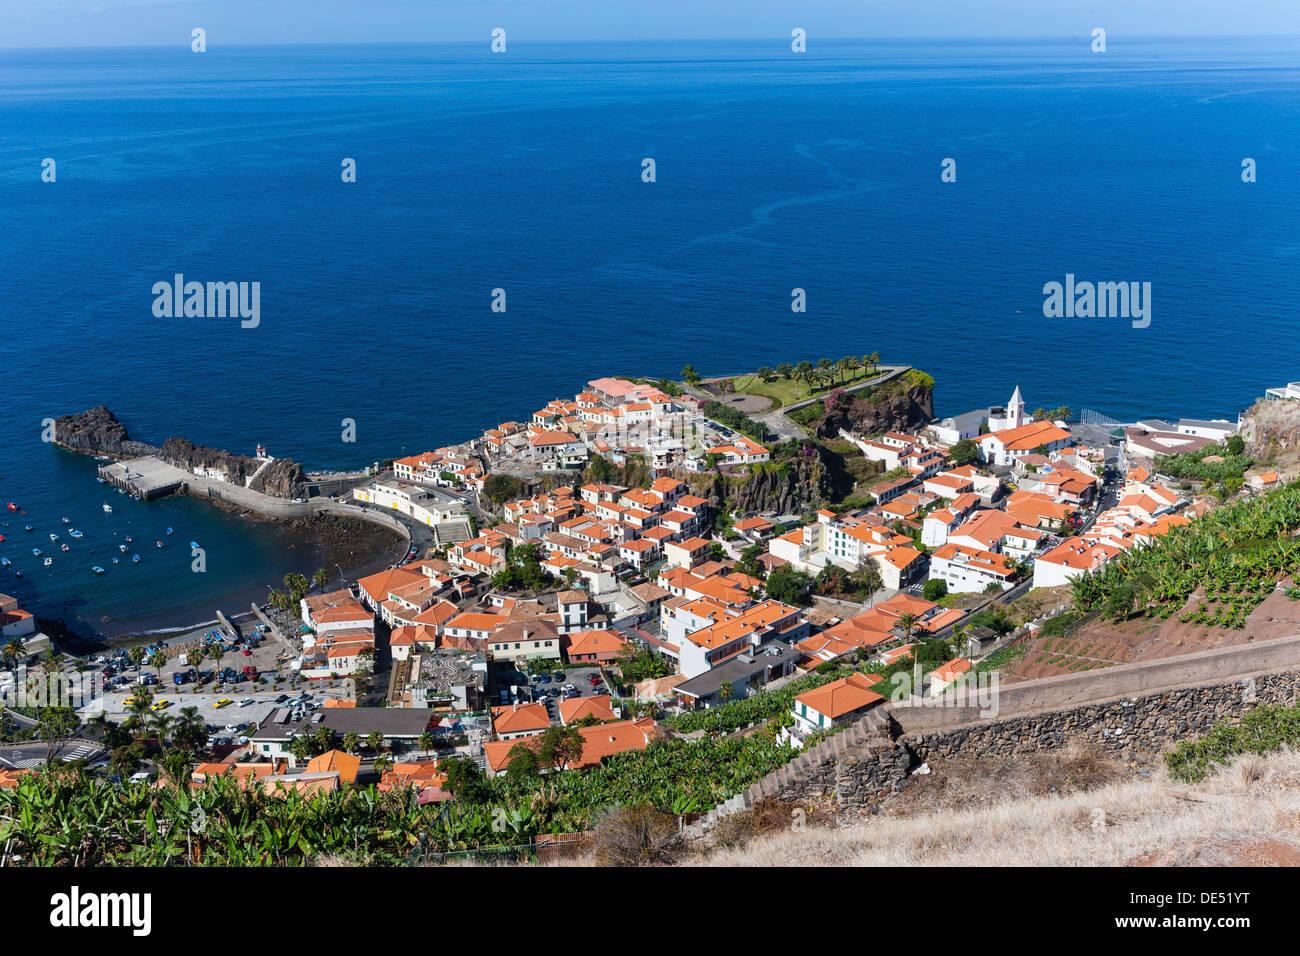 Townscape of Porto de Câmara de Lobos, Funchal, Porto de Camara de Lobos, Ilha da Madeira, Portugal - Stock Image